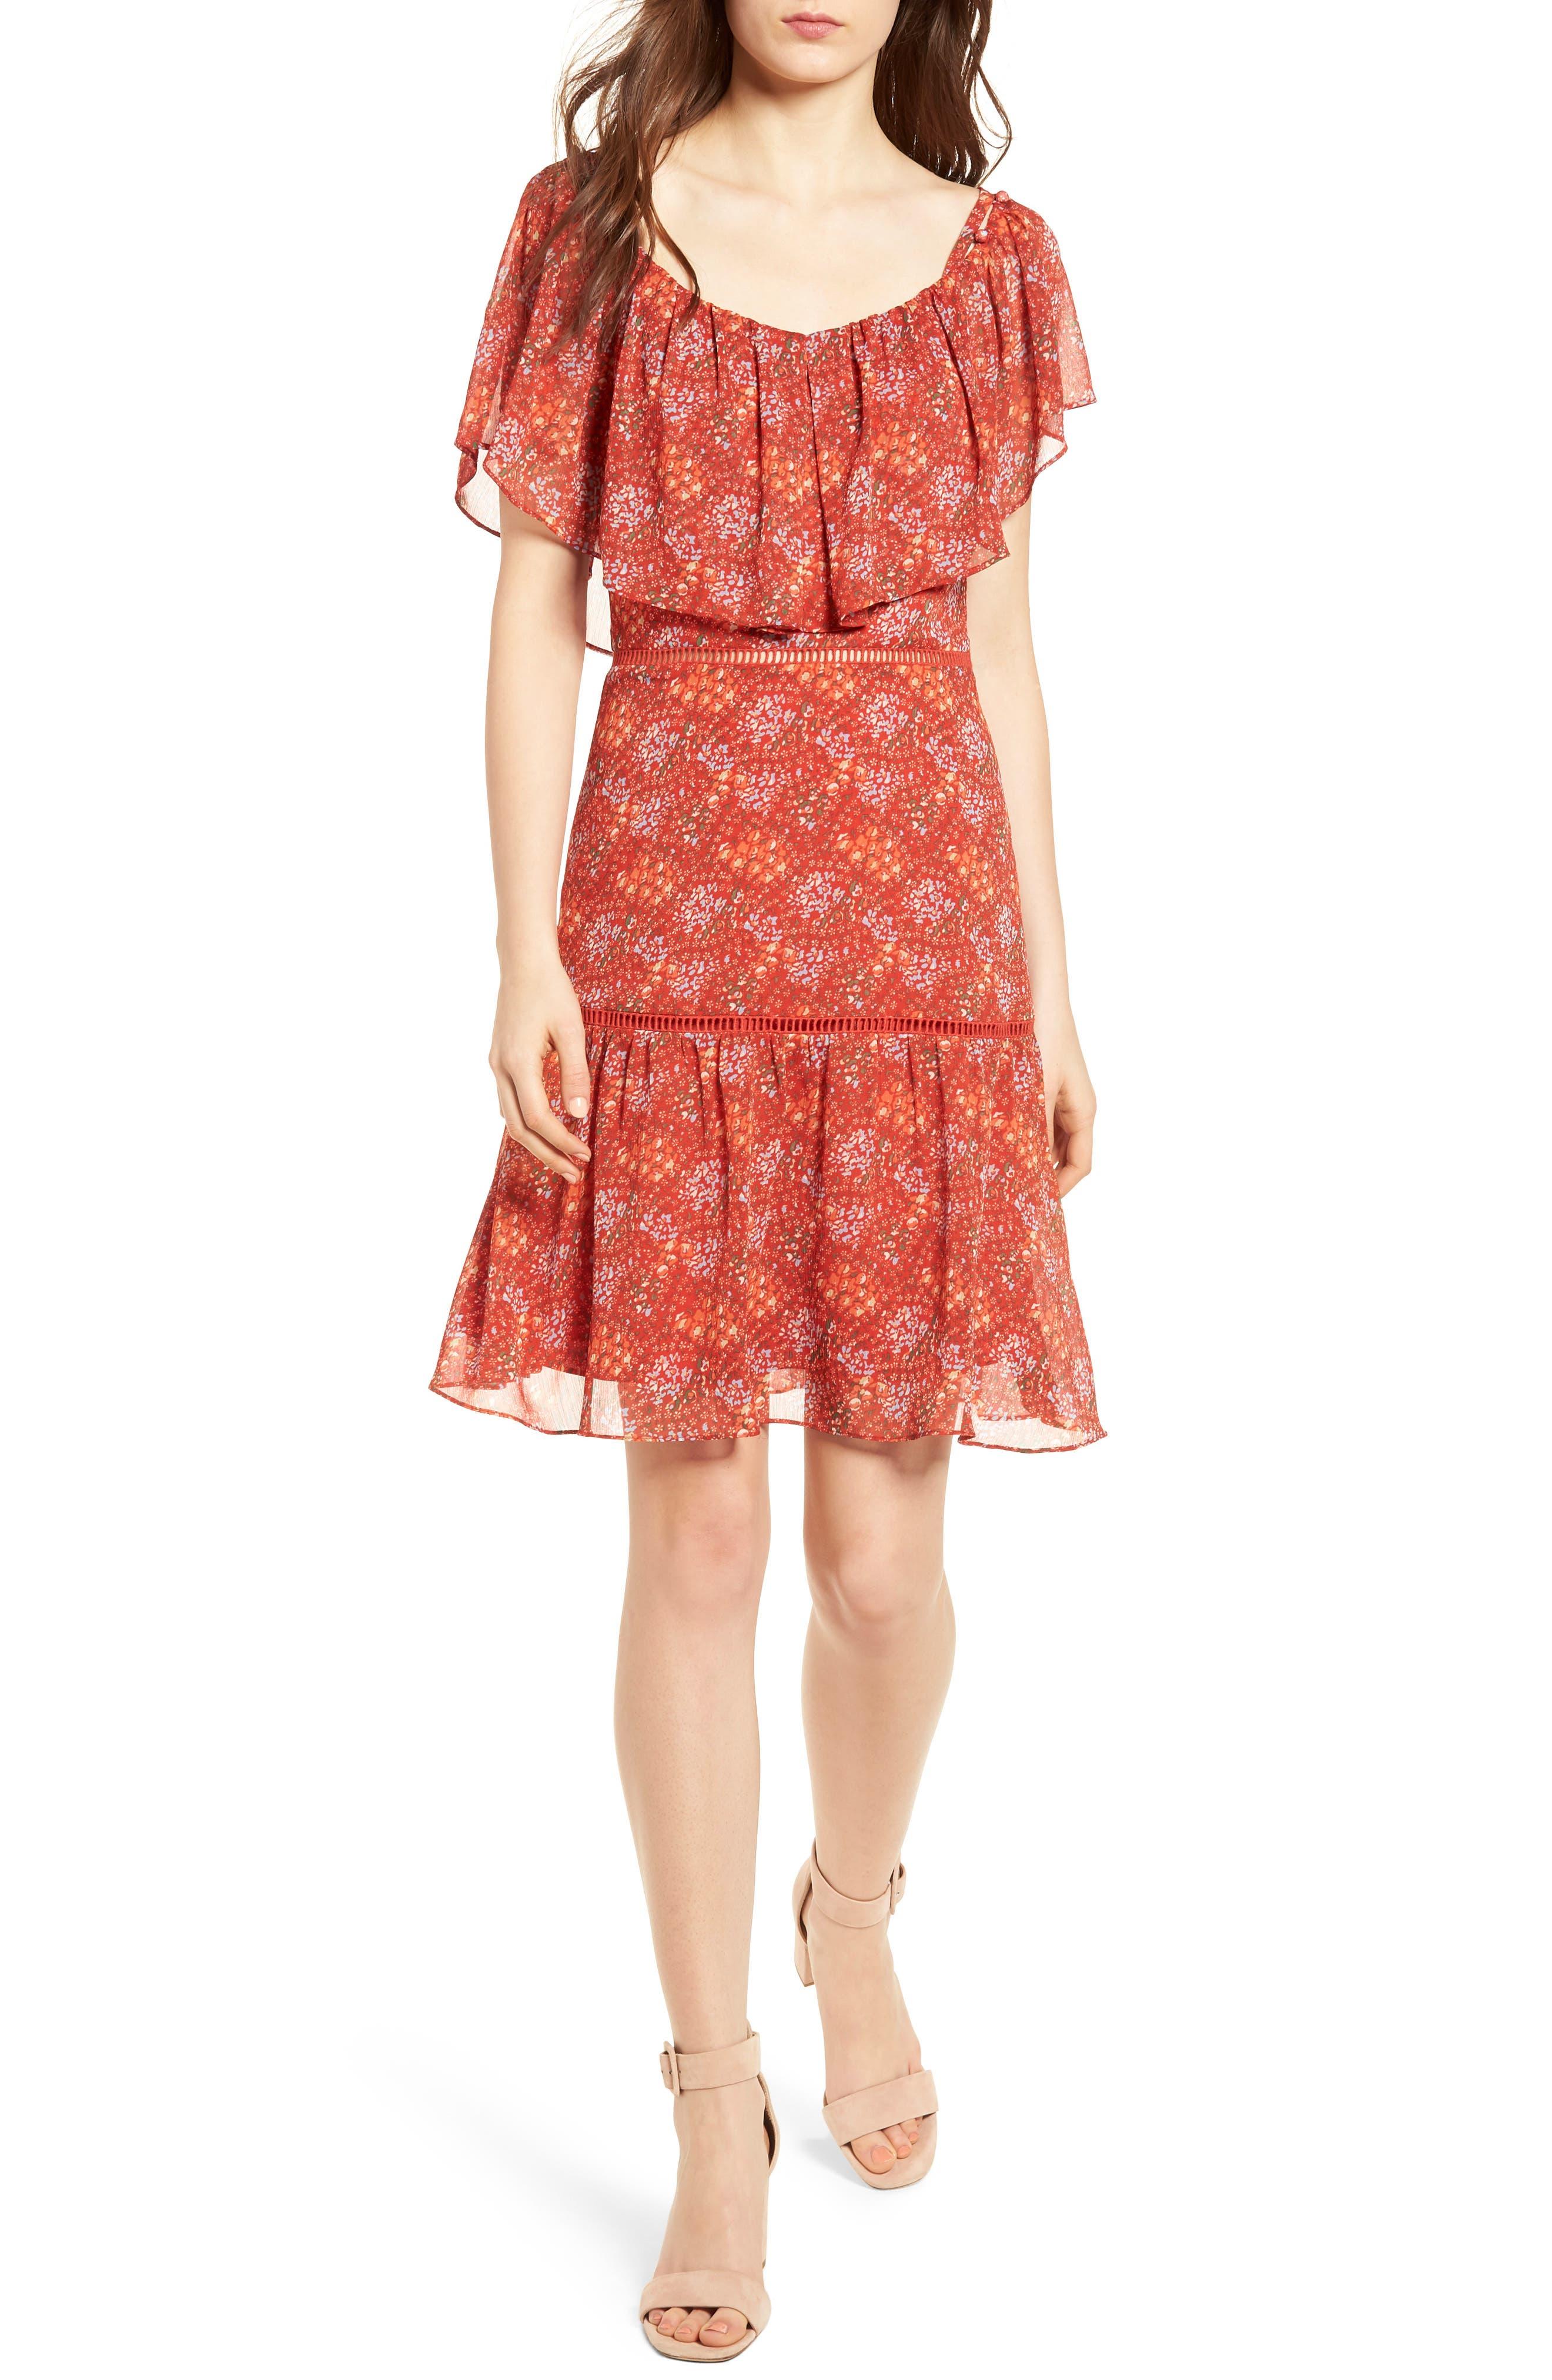 Rebecca Minkoff Lynne Chiffon Dress